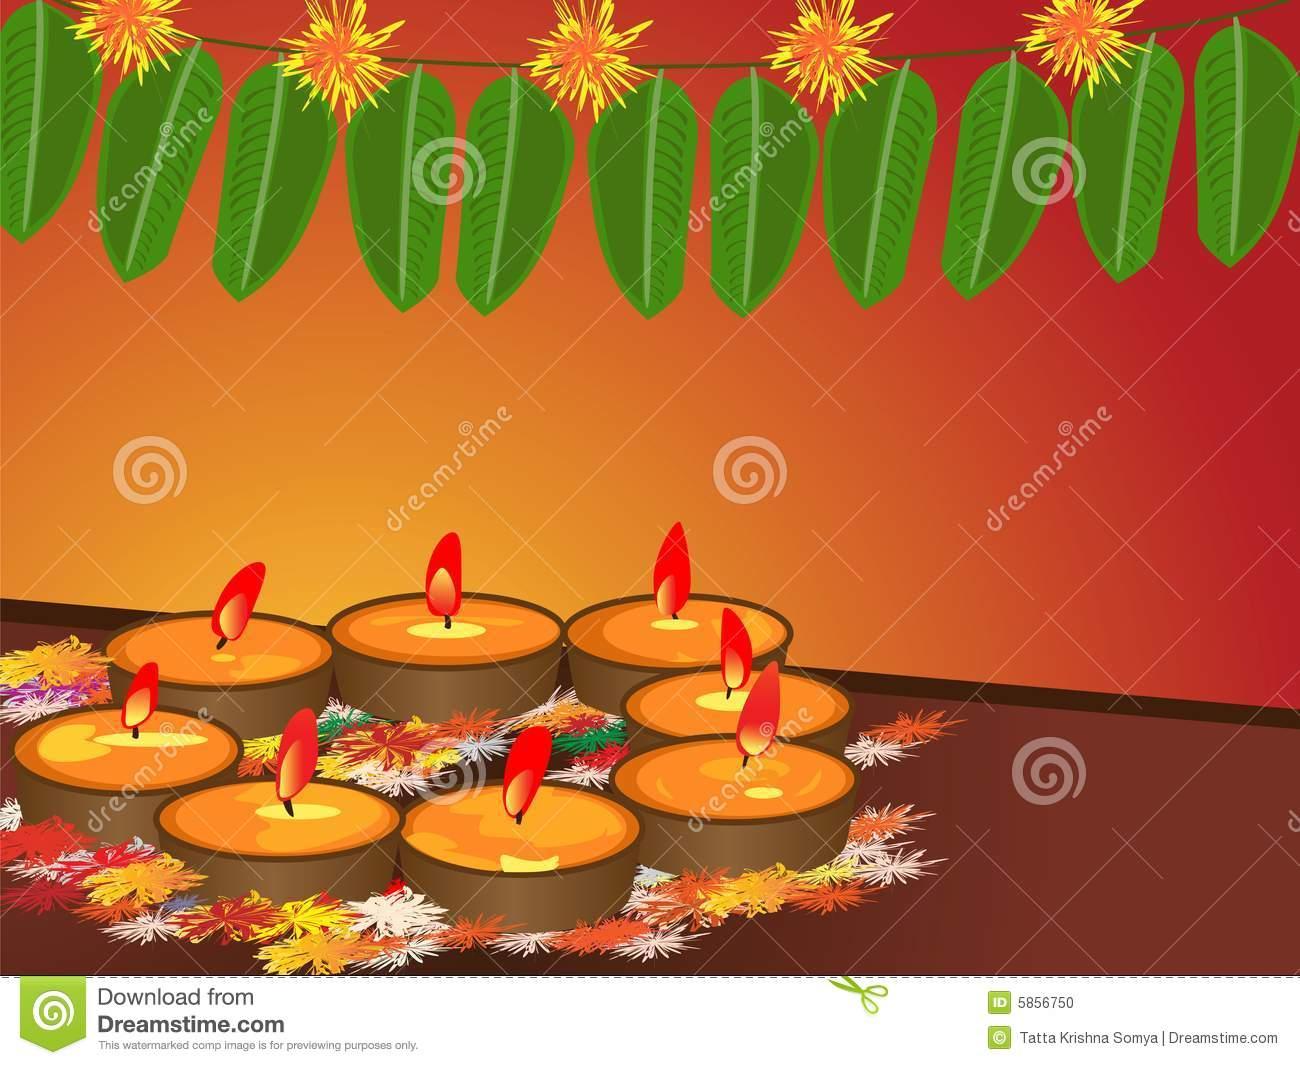 Diwali festival of lights clipart.